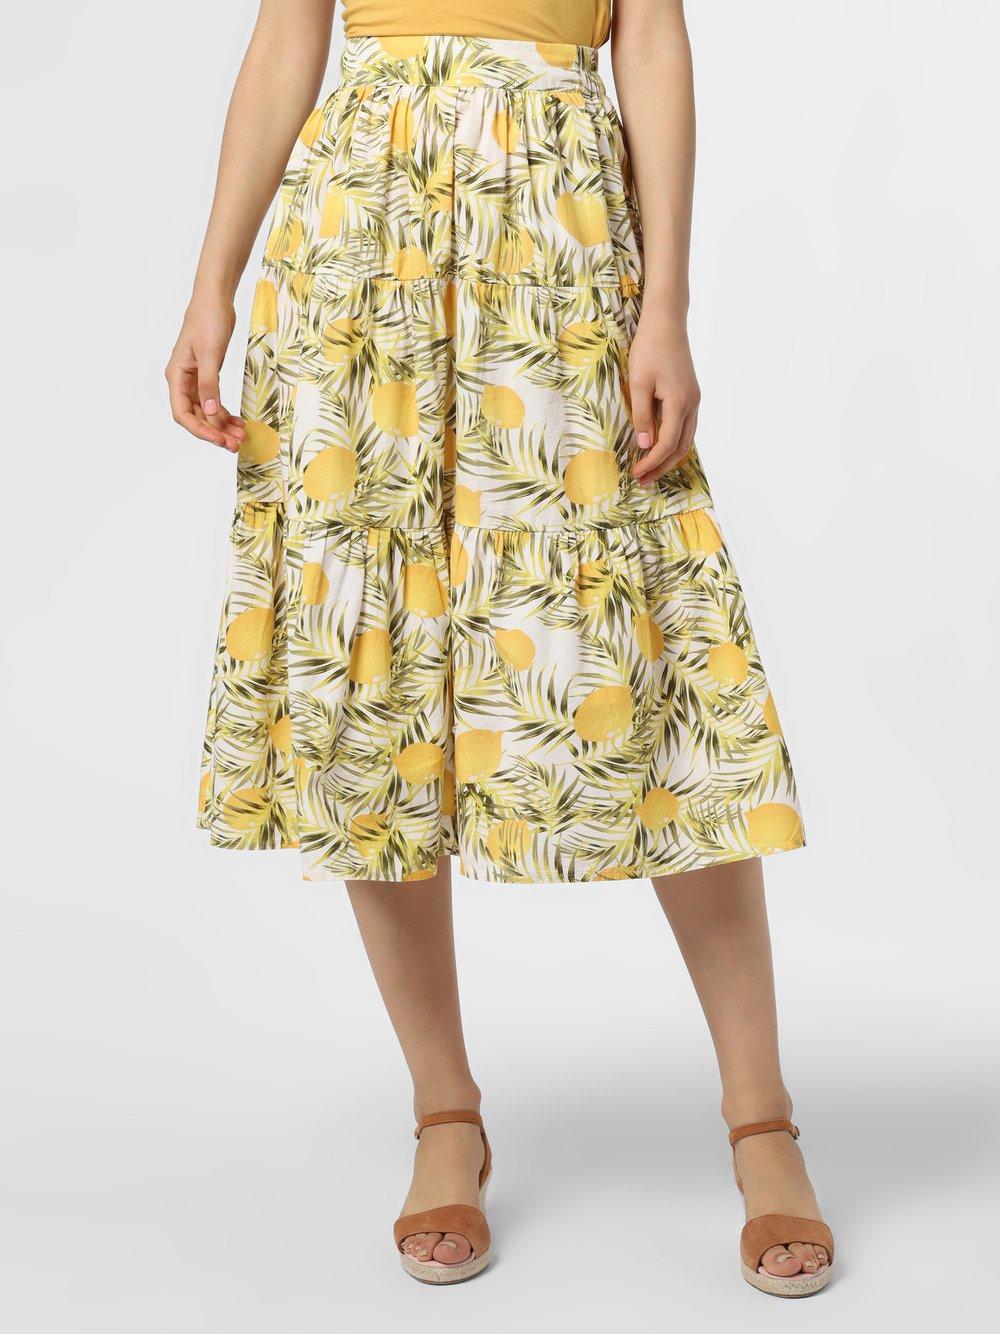 Y.A.S – Spódnica damska – YASEmily, żółty Van Graaf 483147-0001